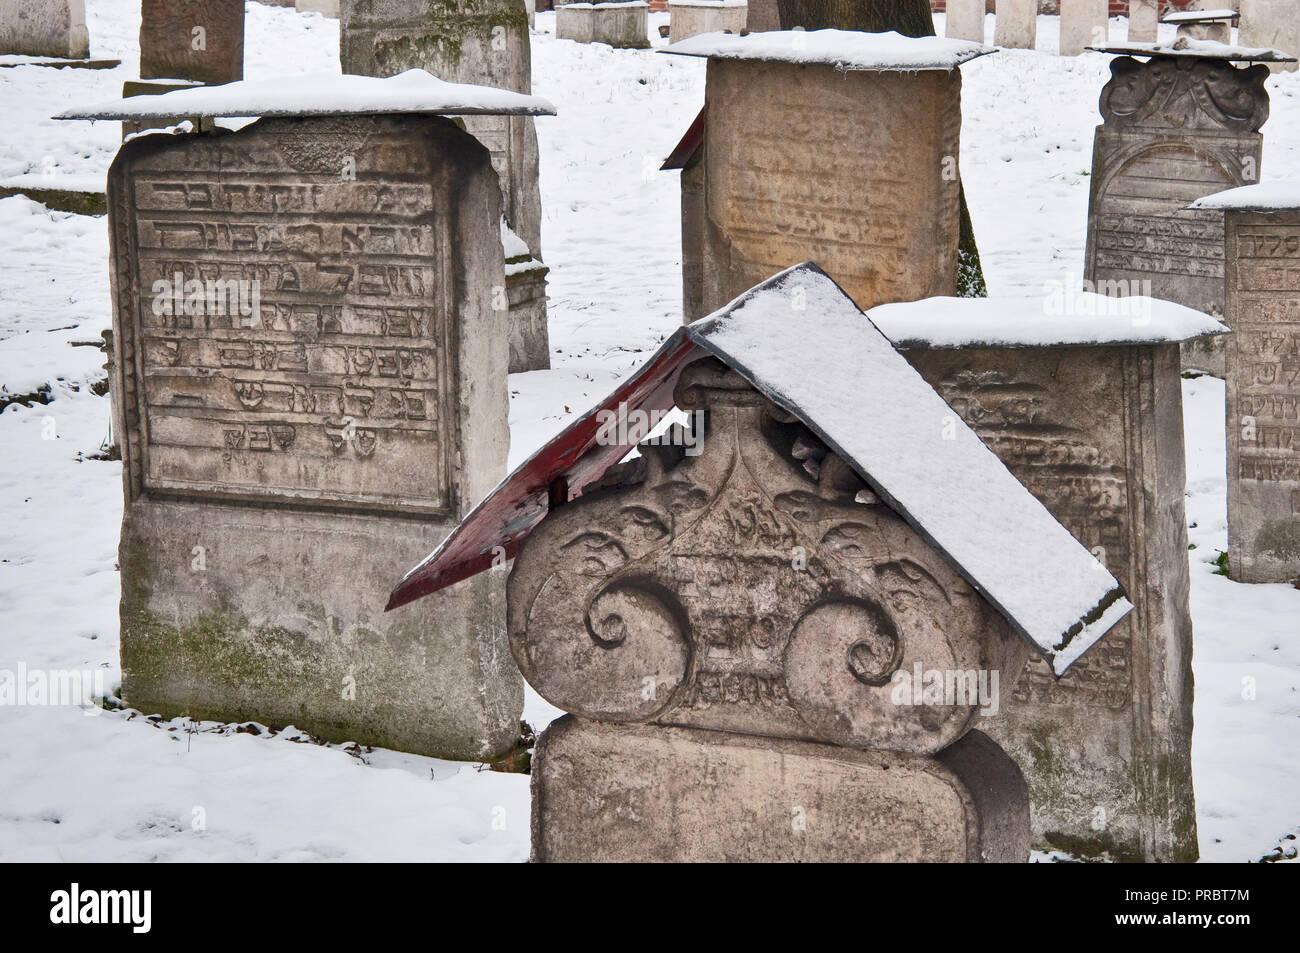 Gravestones at Remuh Cemetery, Jewish Quarter at Kazimierz district, Krakow, Poland - Stock Image